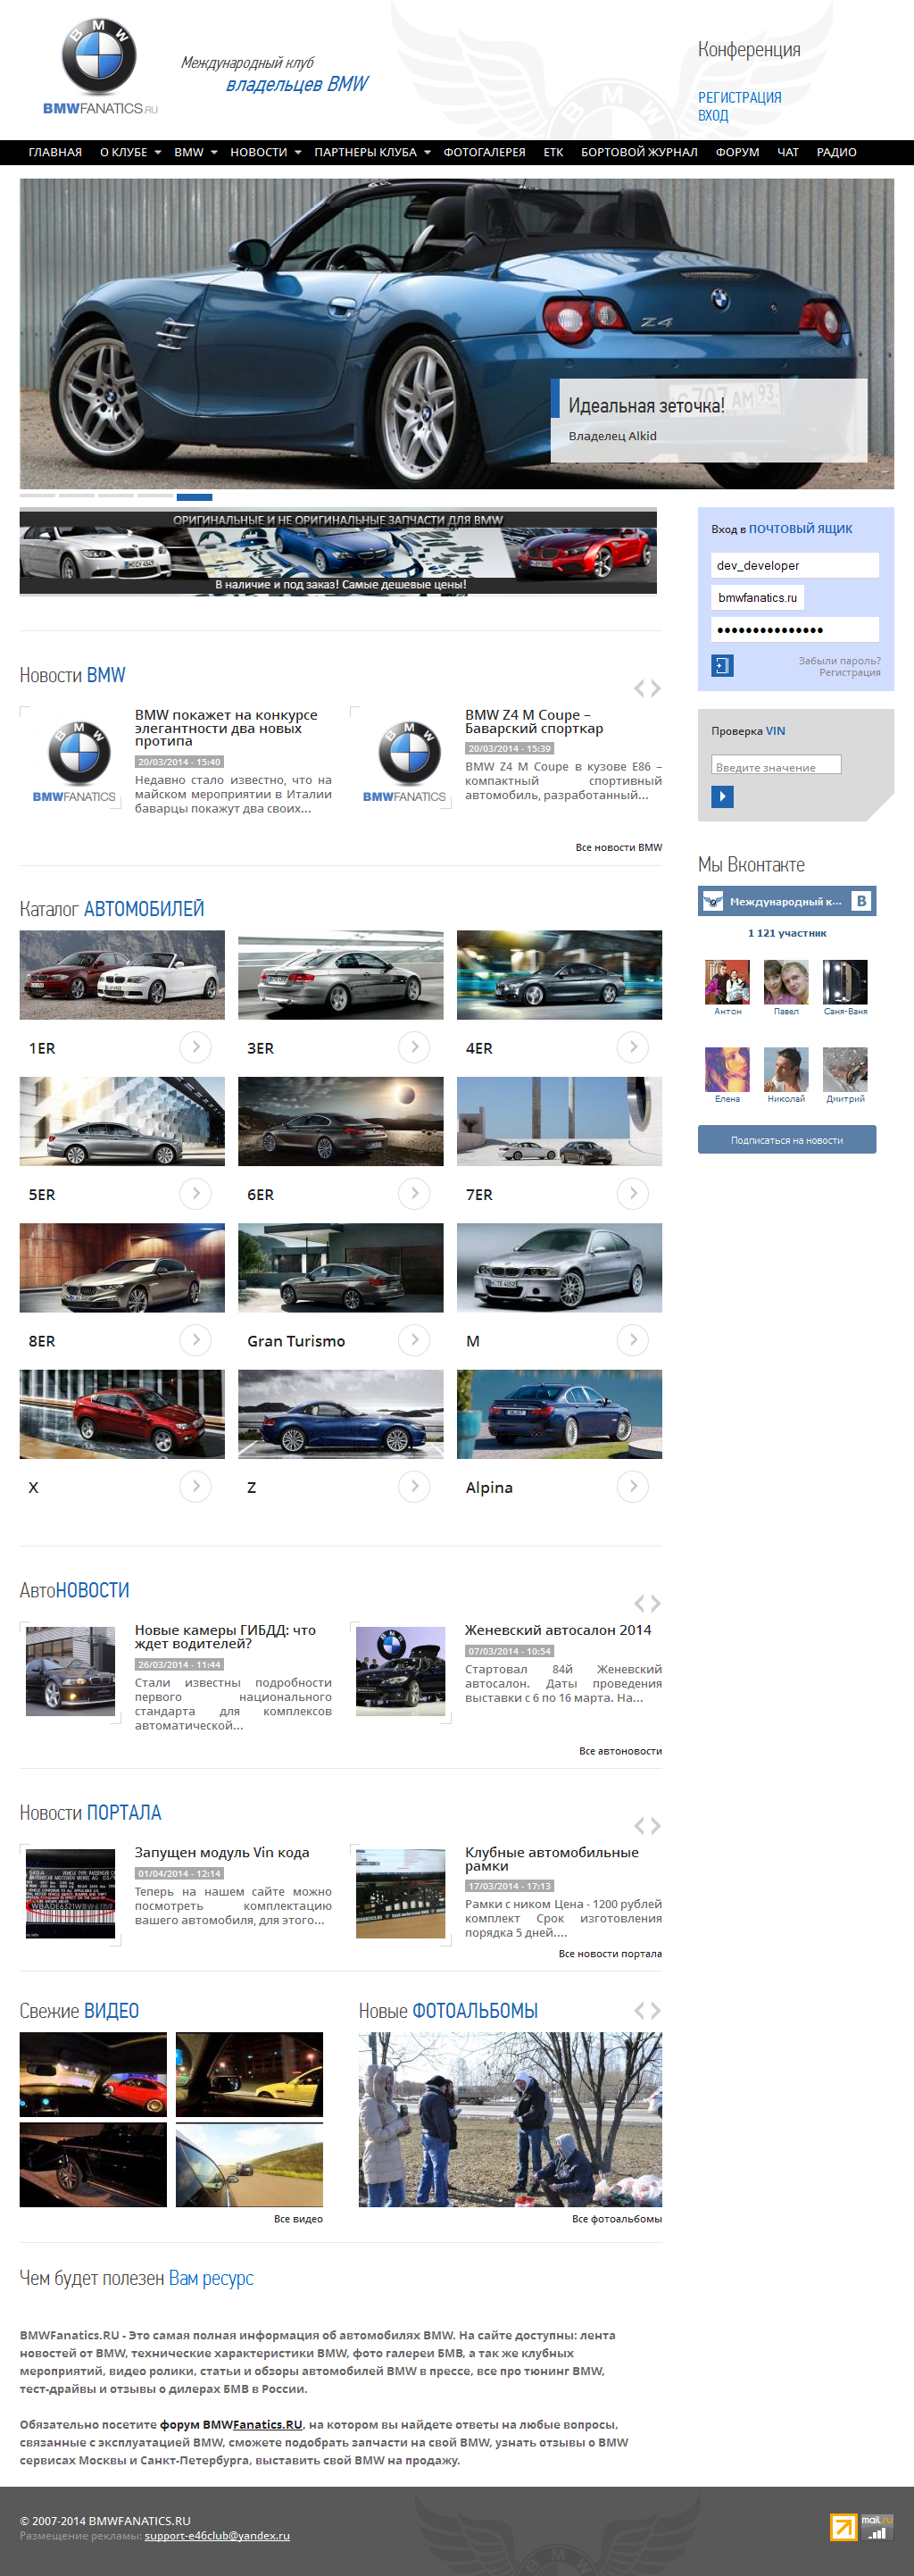 Портал клуба владельцев BMW (Drupal)